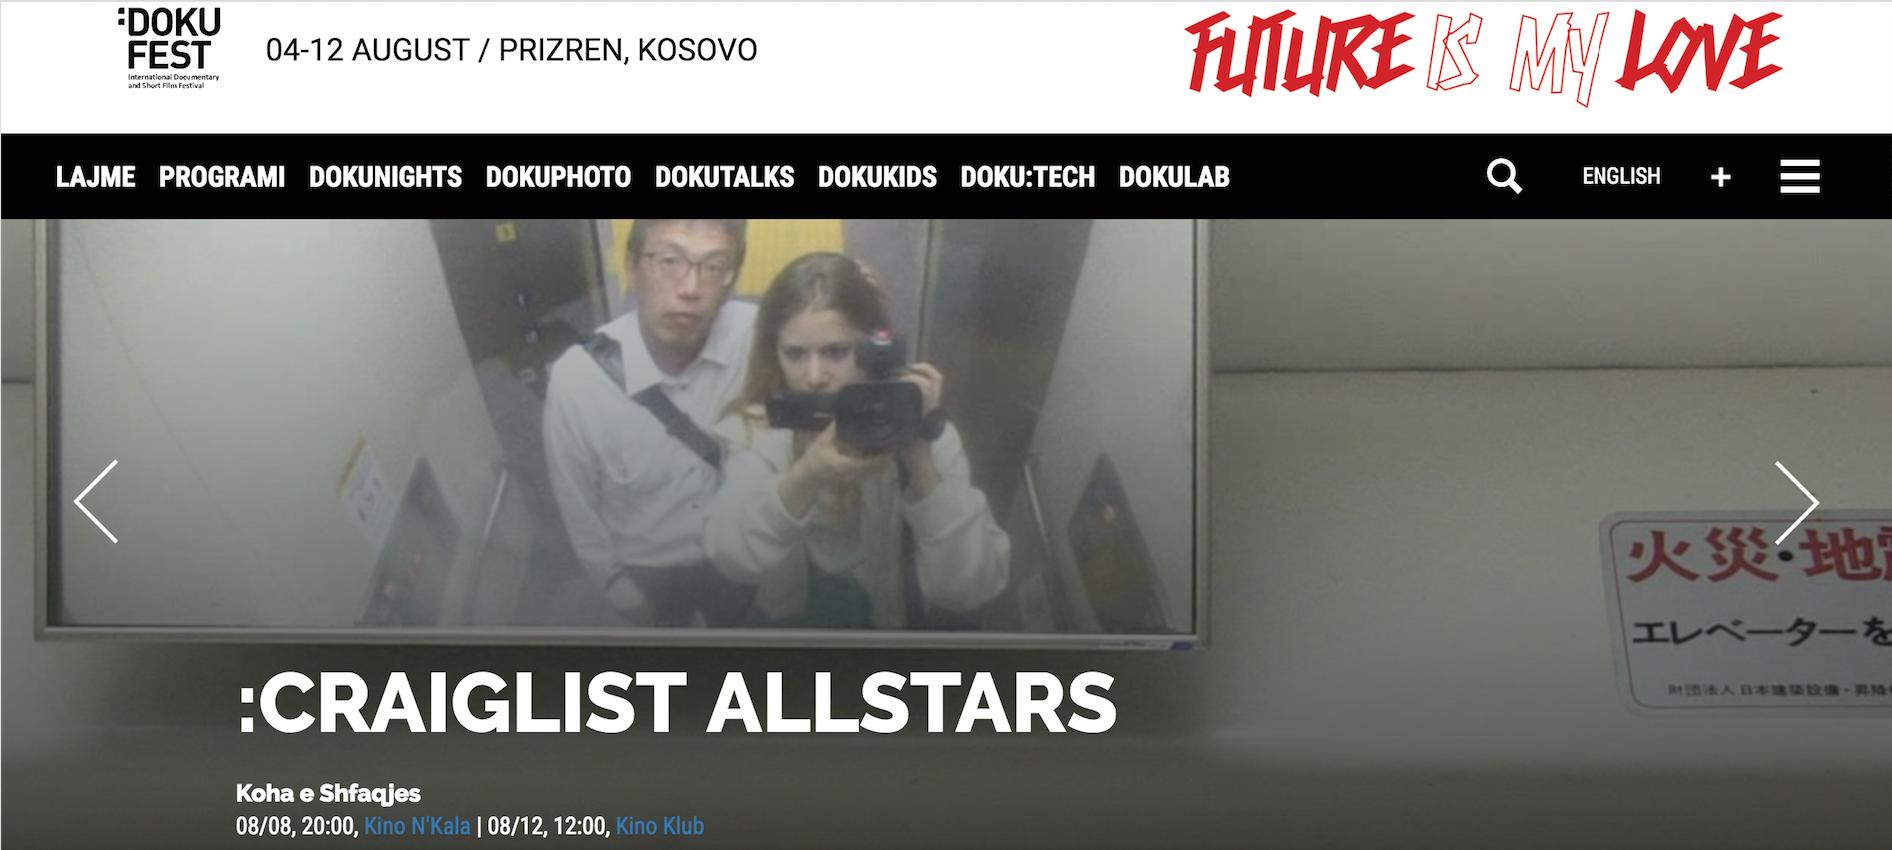 Craigslist Allstars at Doku Fest Kosovo 8th & 12th of August